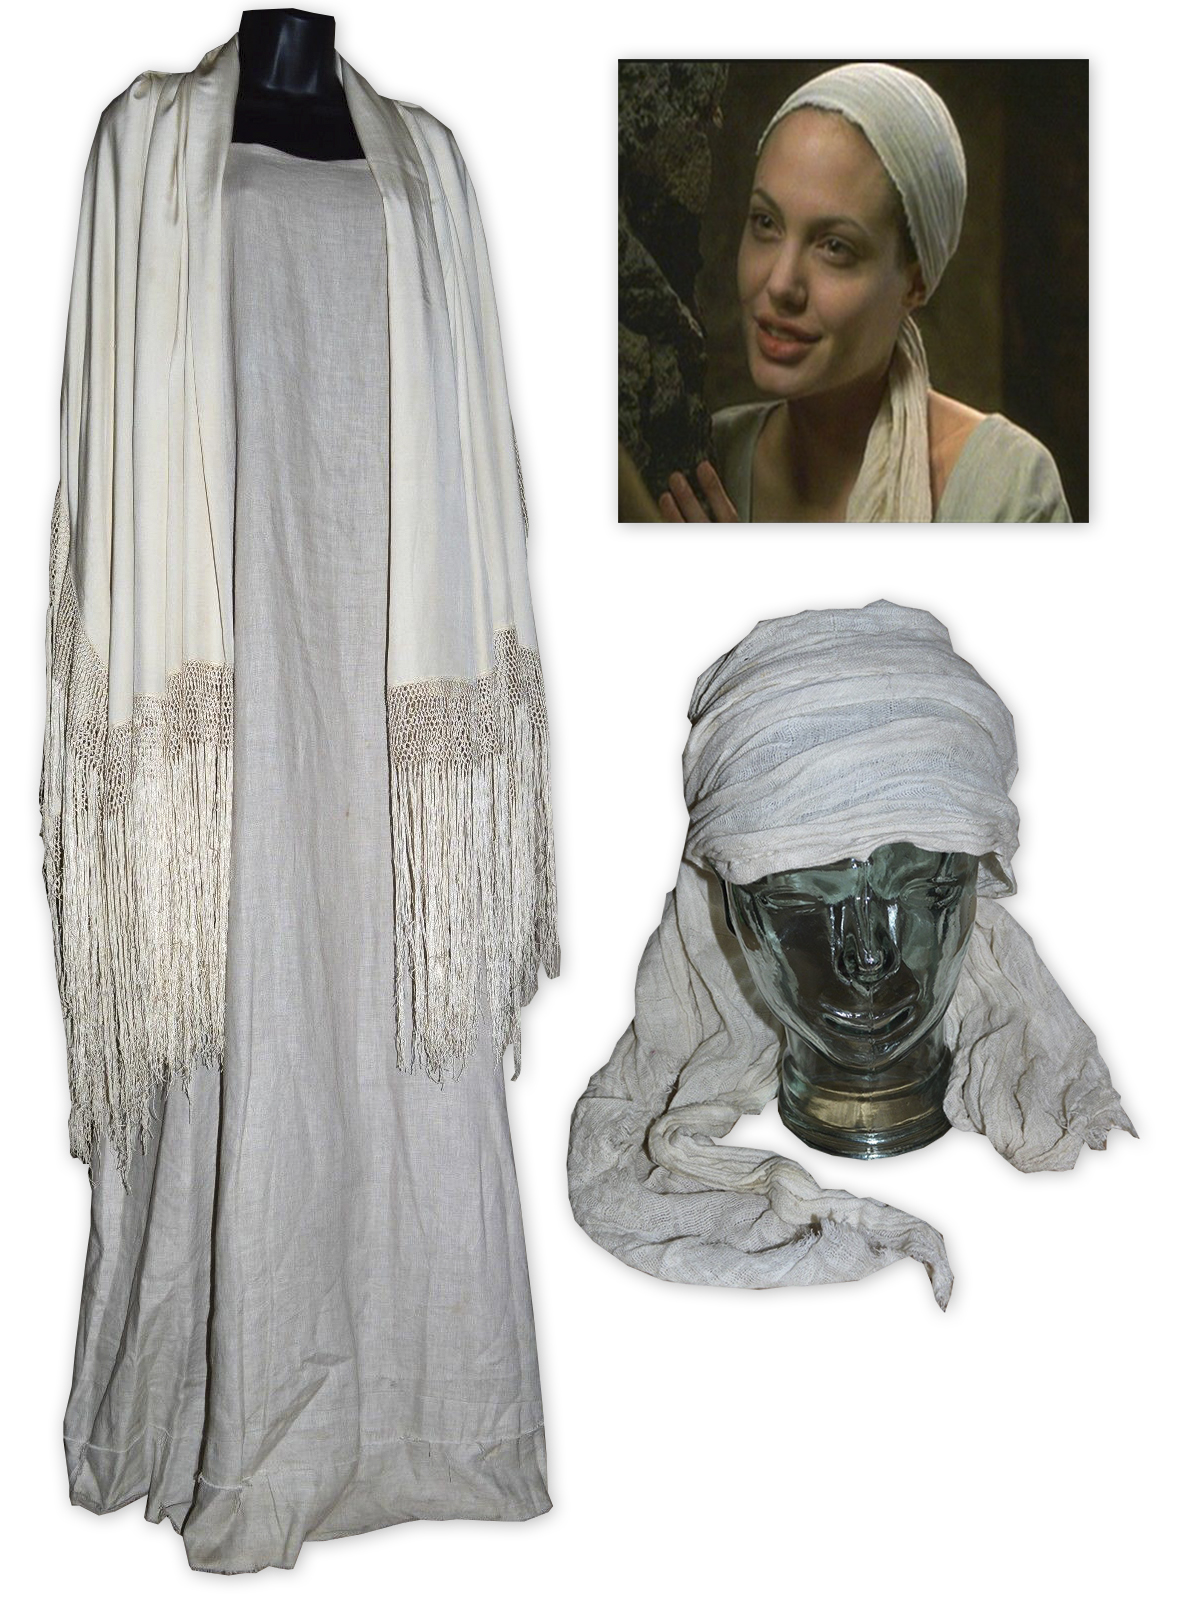 Angelina Jolie Original Sin lot detail - angelina jolie screen-worn costume from